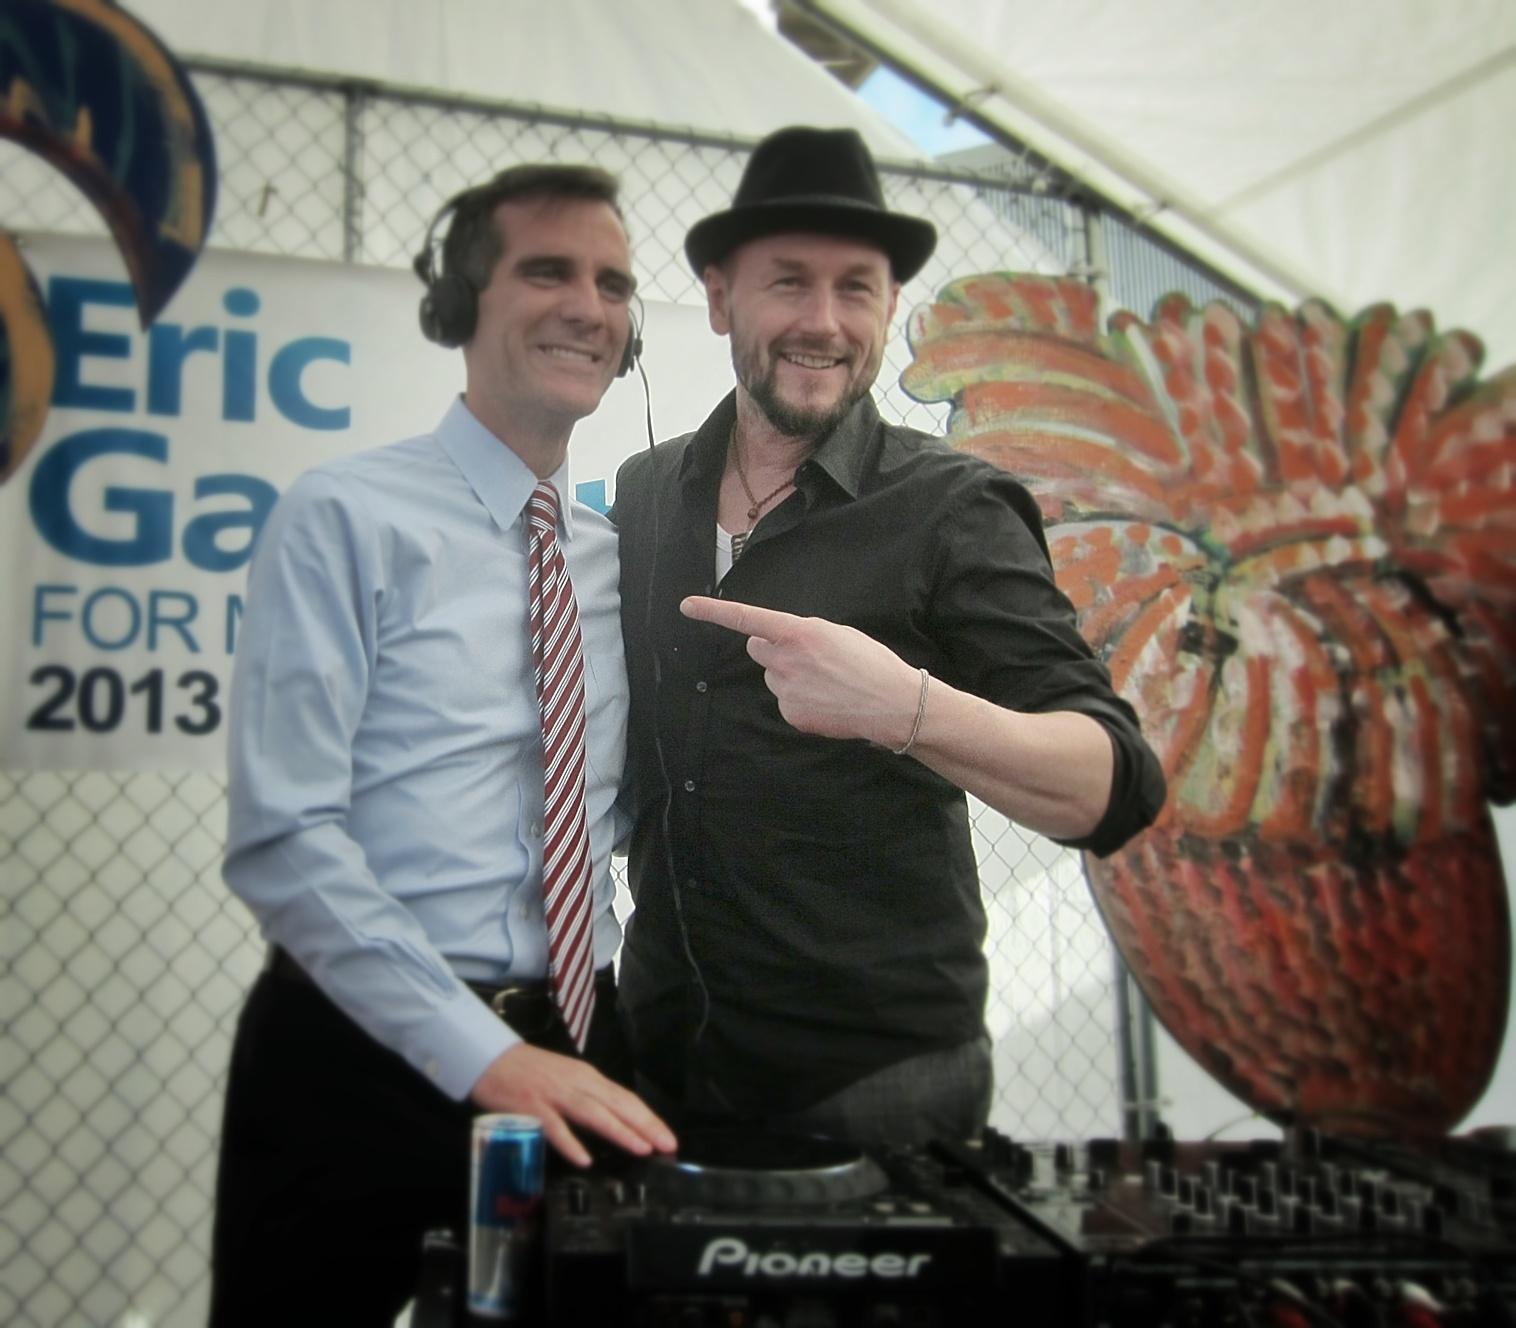 Eric Garcetti & DJ Bart Thimbles.jpg